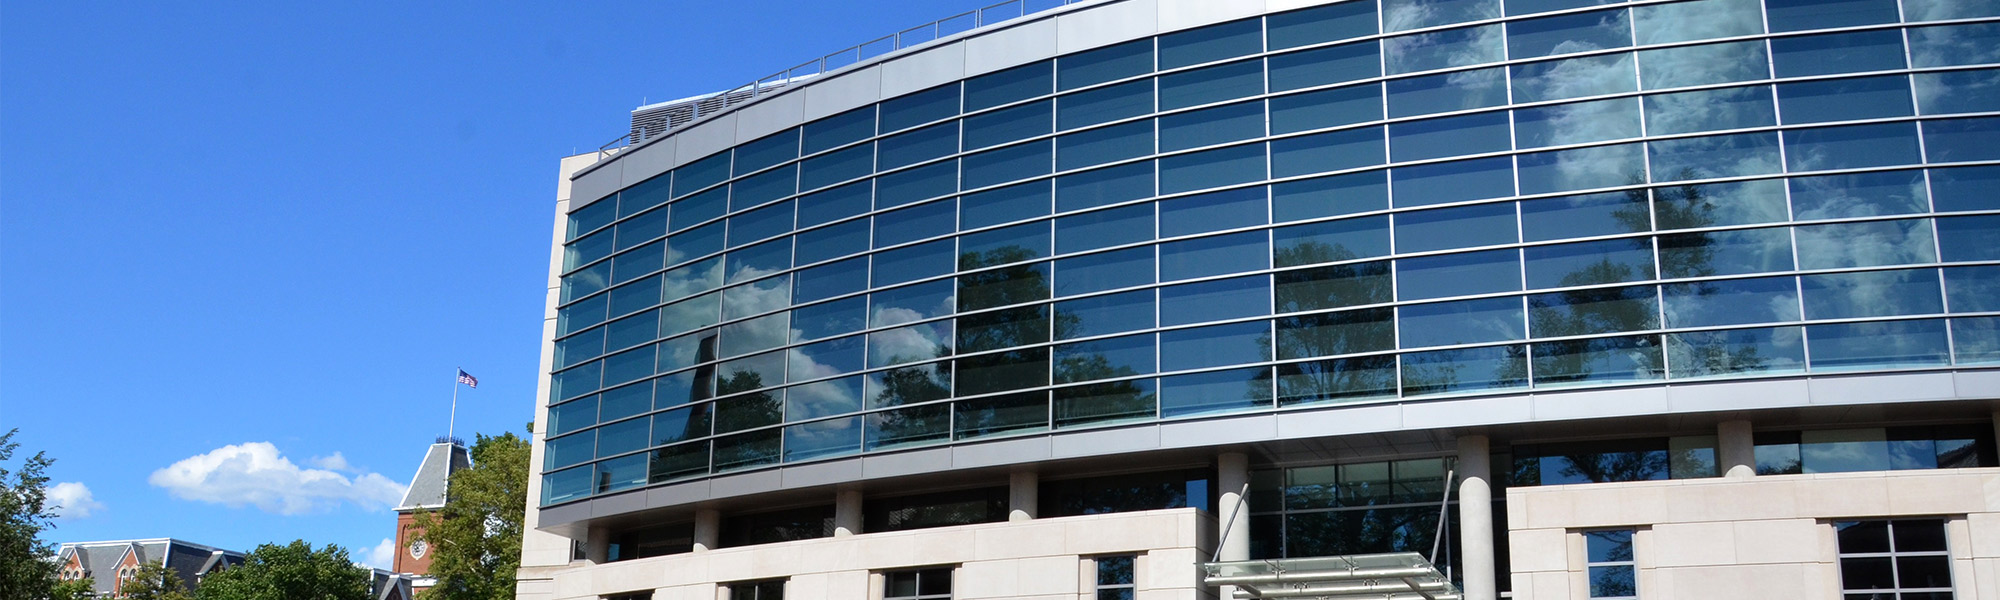 Ohio window tinting company